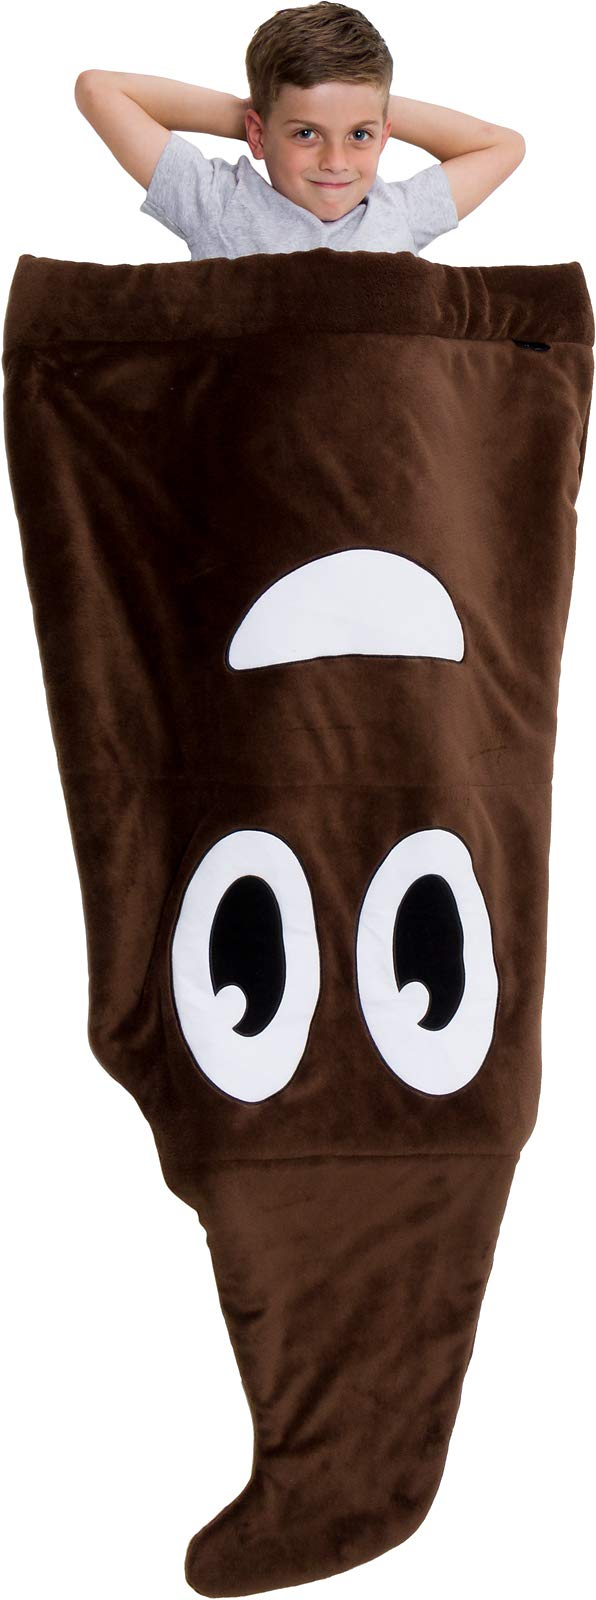 Silver Lilly Emoji Fleece Blanket - Novelty Plush Sleeping Bag Throw Blanket for Kids